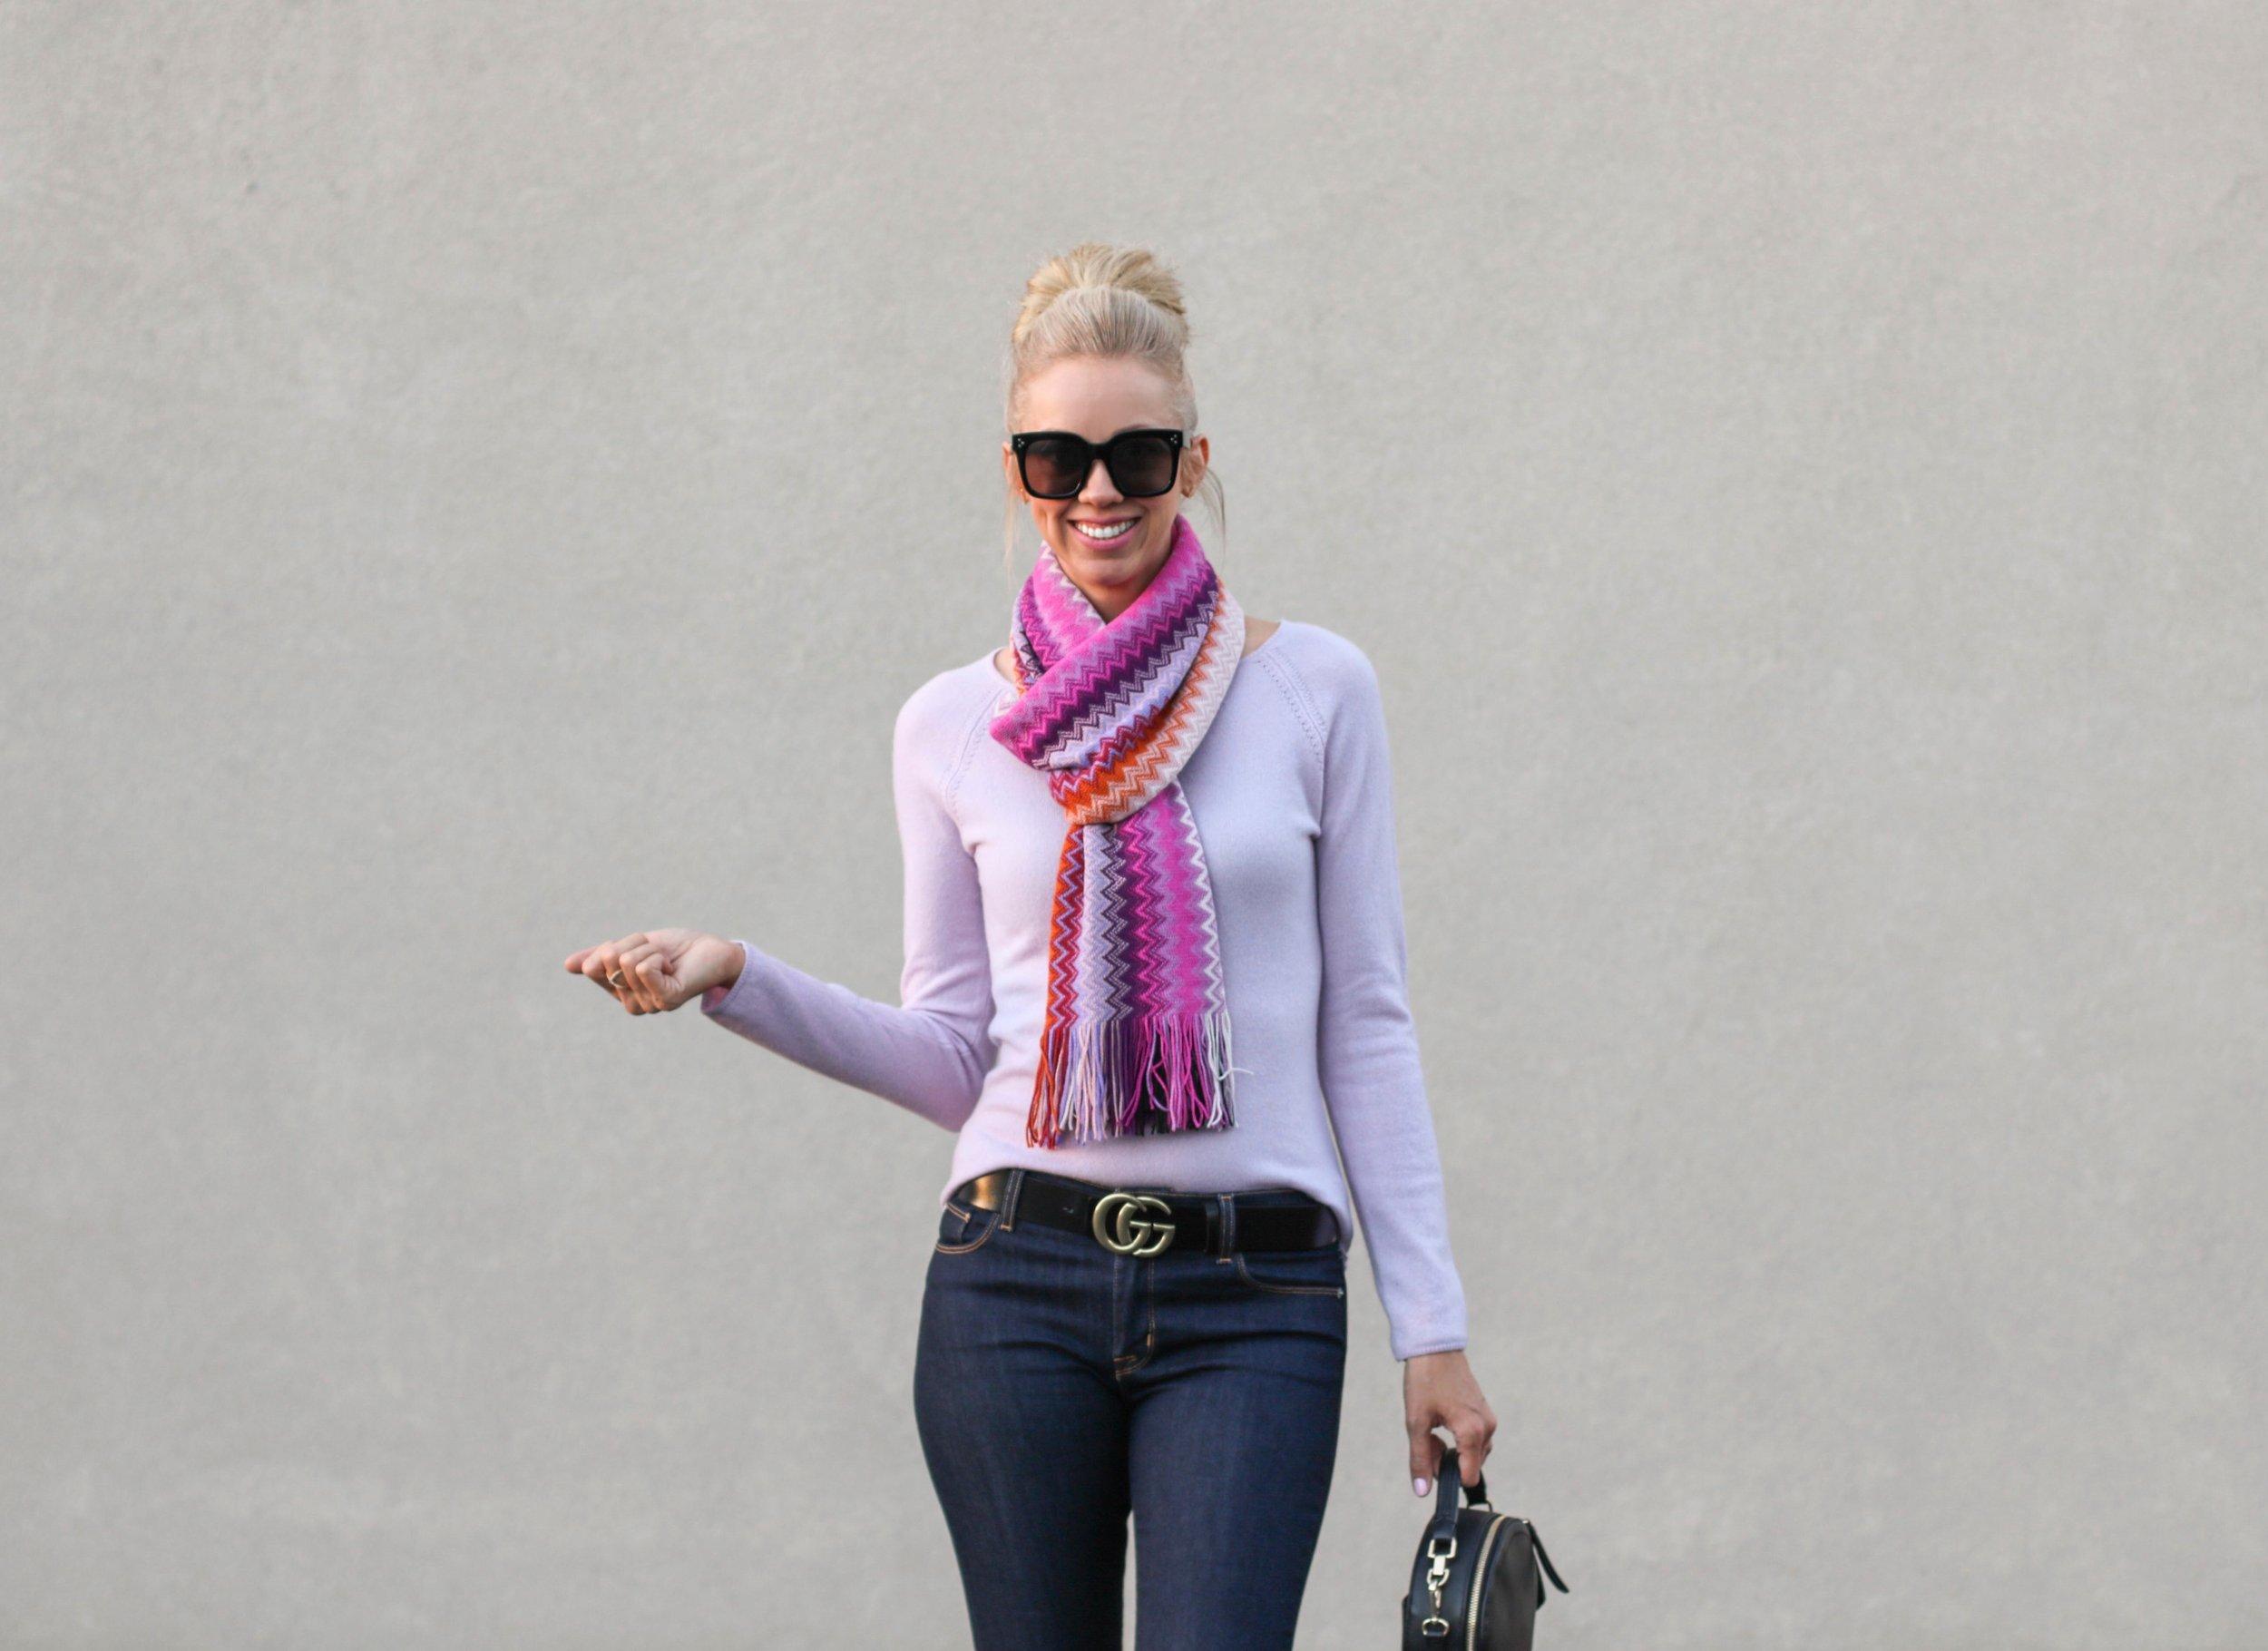 missoni-chevron-scarf-purple-cashmere-sweater-gucci-belt-street-style.jpg